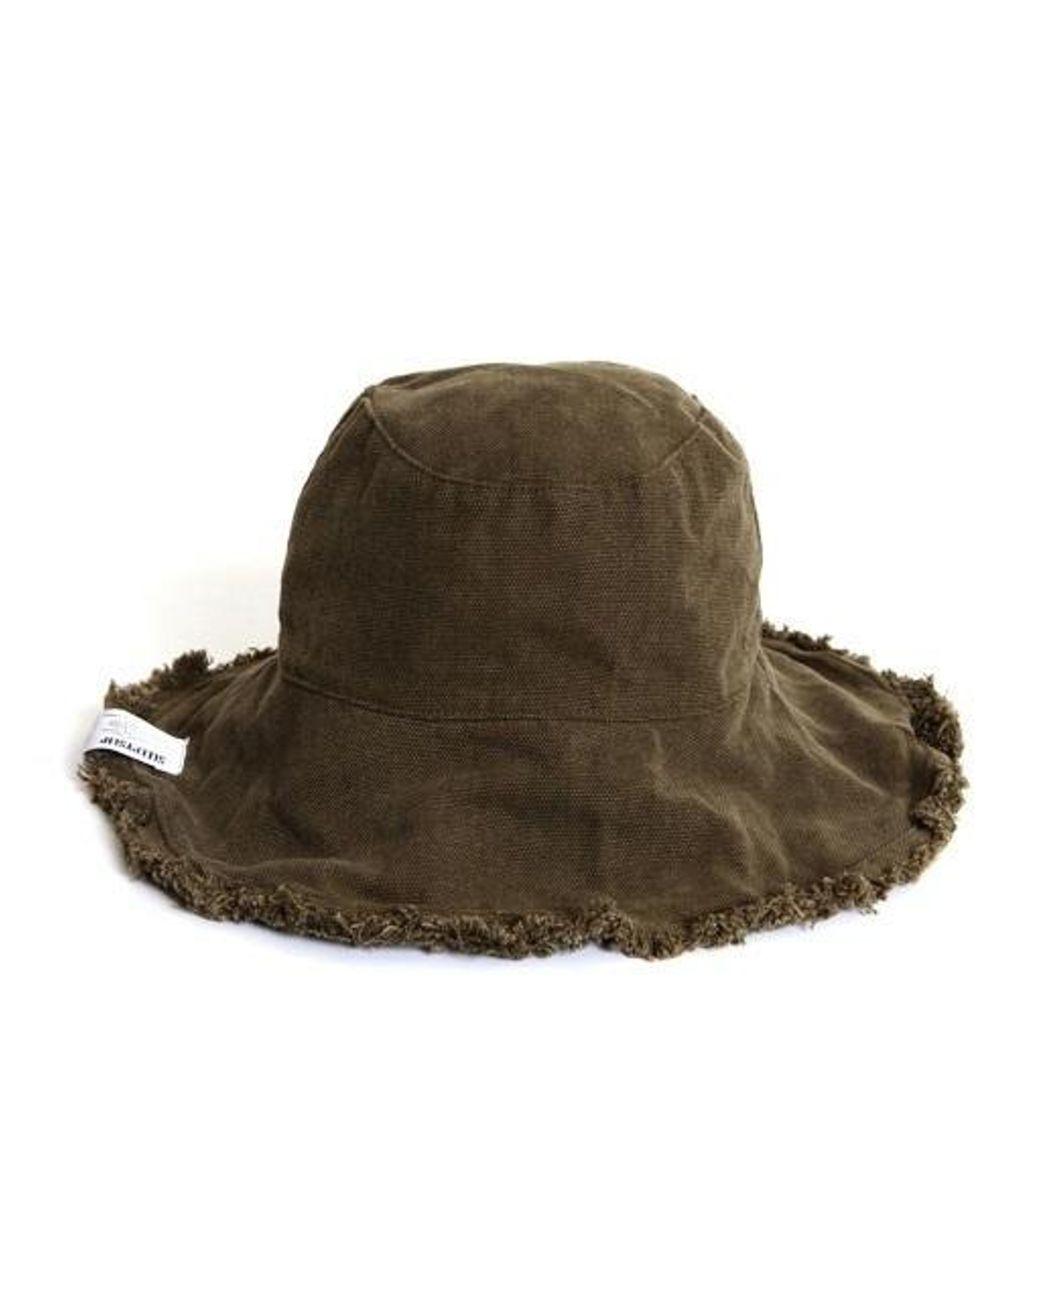 bbbcc4b8849 SLEEPYSLIP Reversible Khaki Bucket Hat in Natural - Lyst